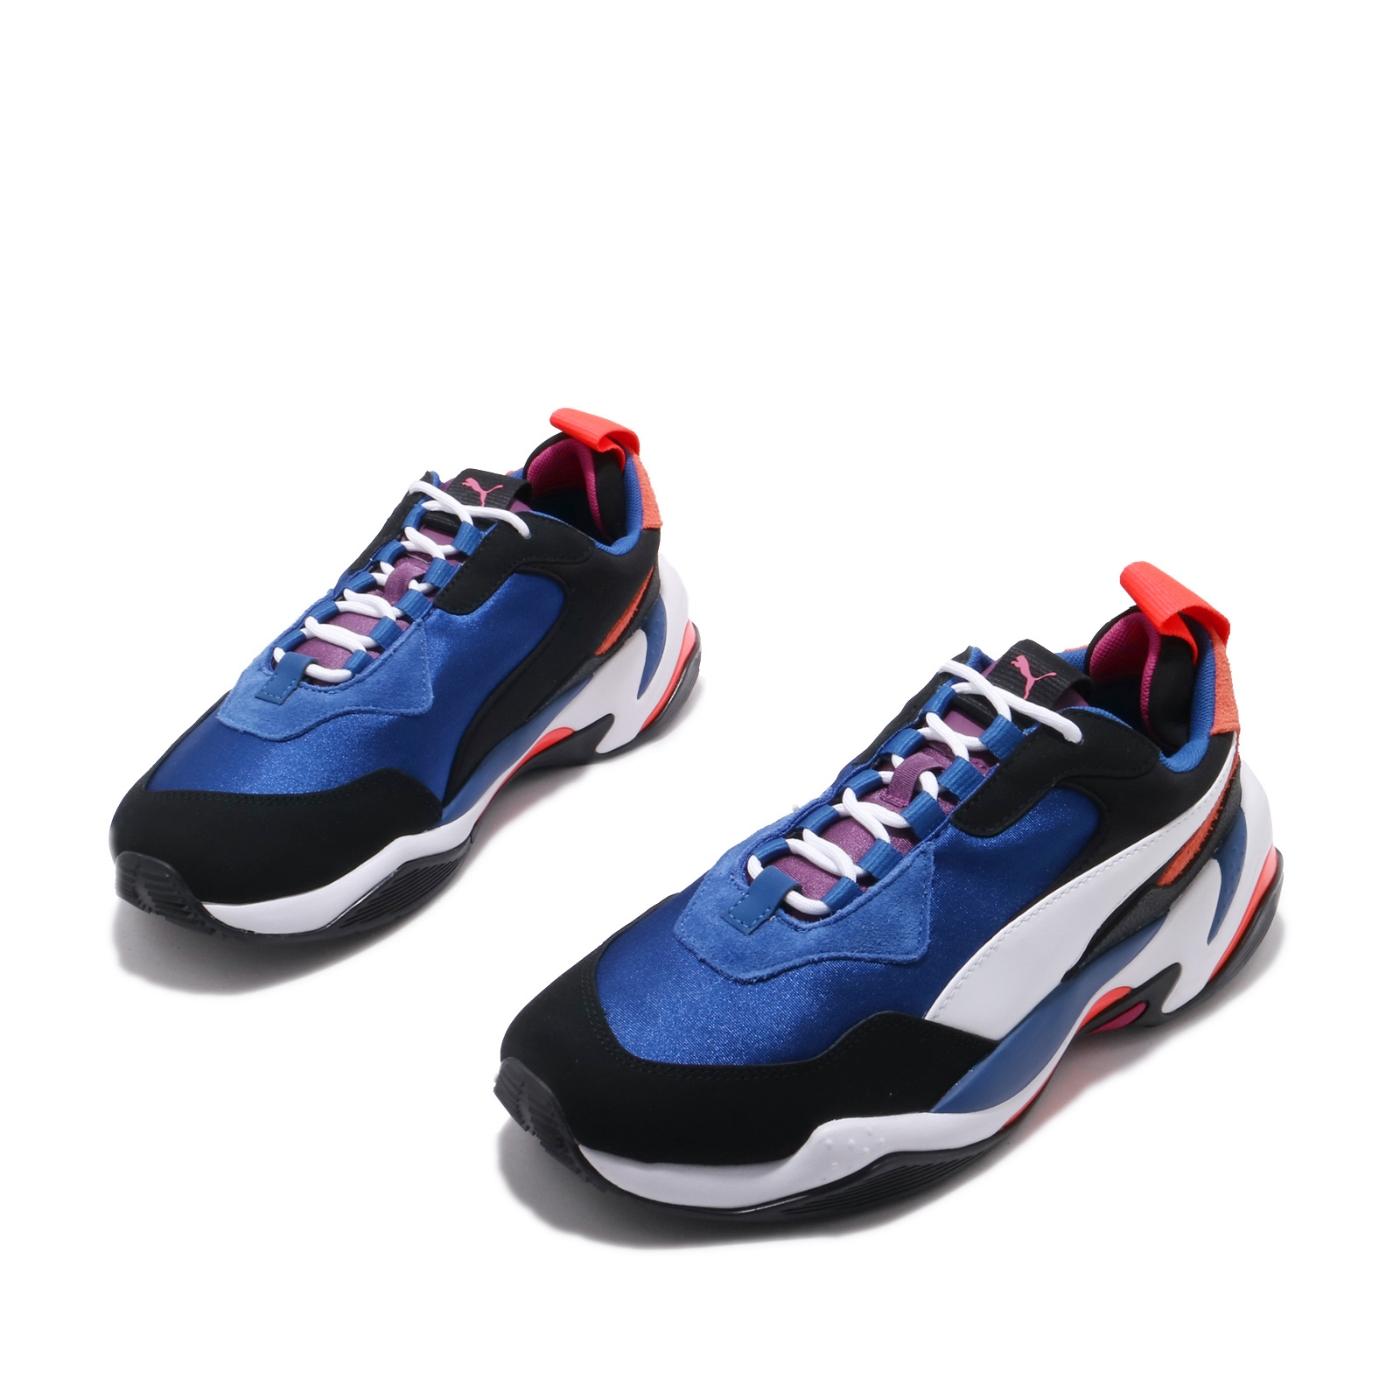 Puma 休閒鞋 Thunder 4 Life 運動 男女鞋